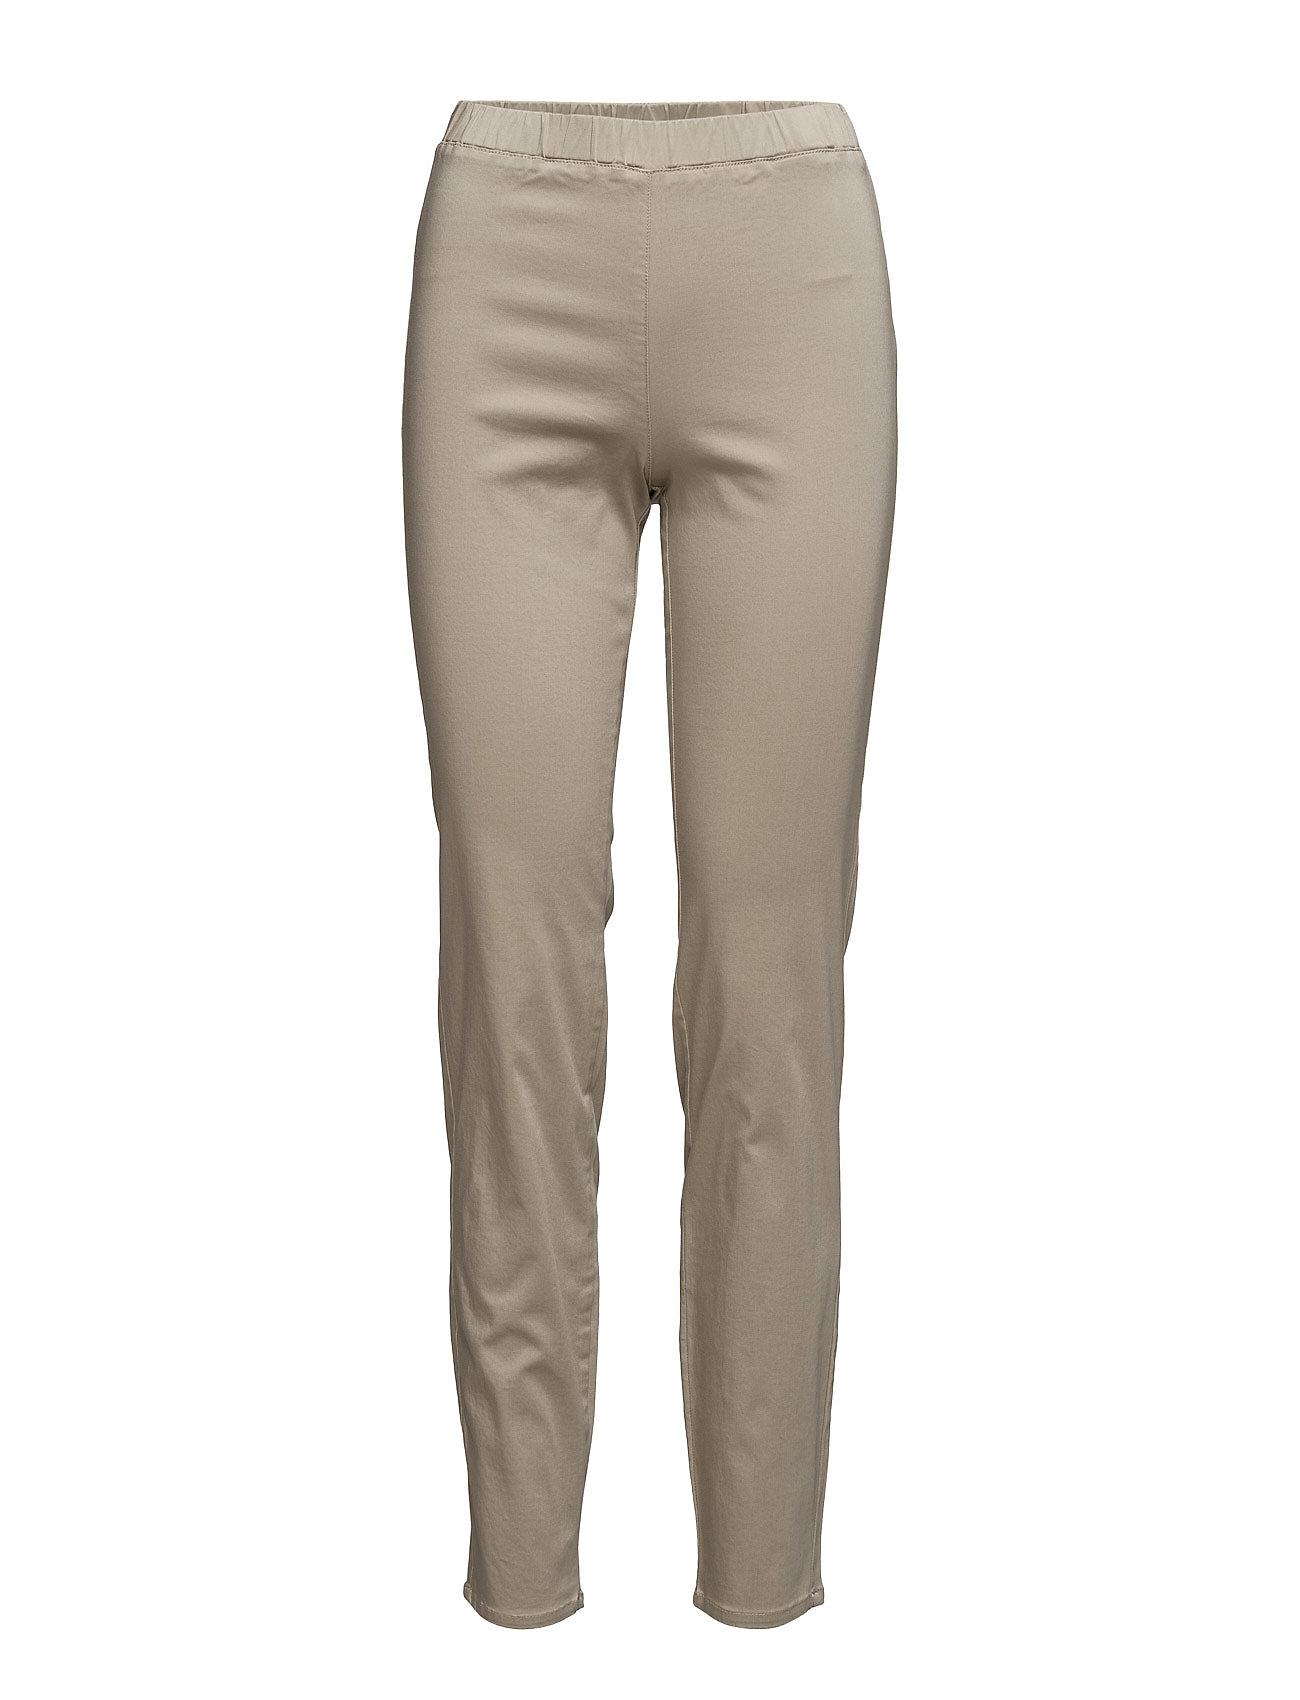 Primitiva Trousers Ew Basic Masai Skinny til Damer i khaki